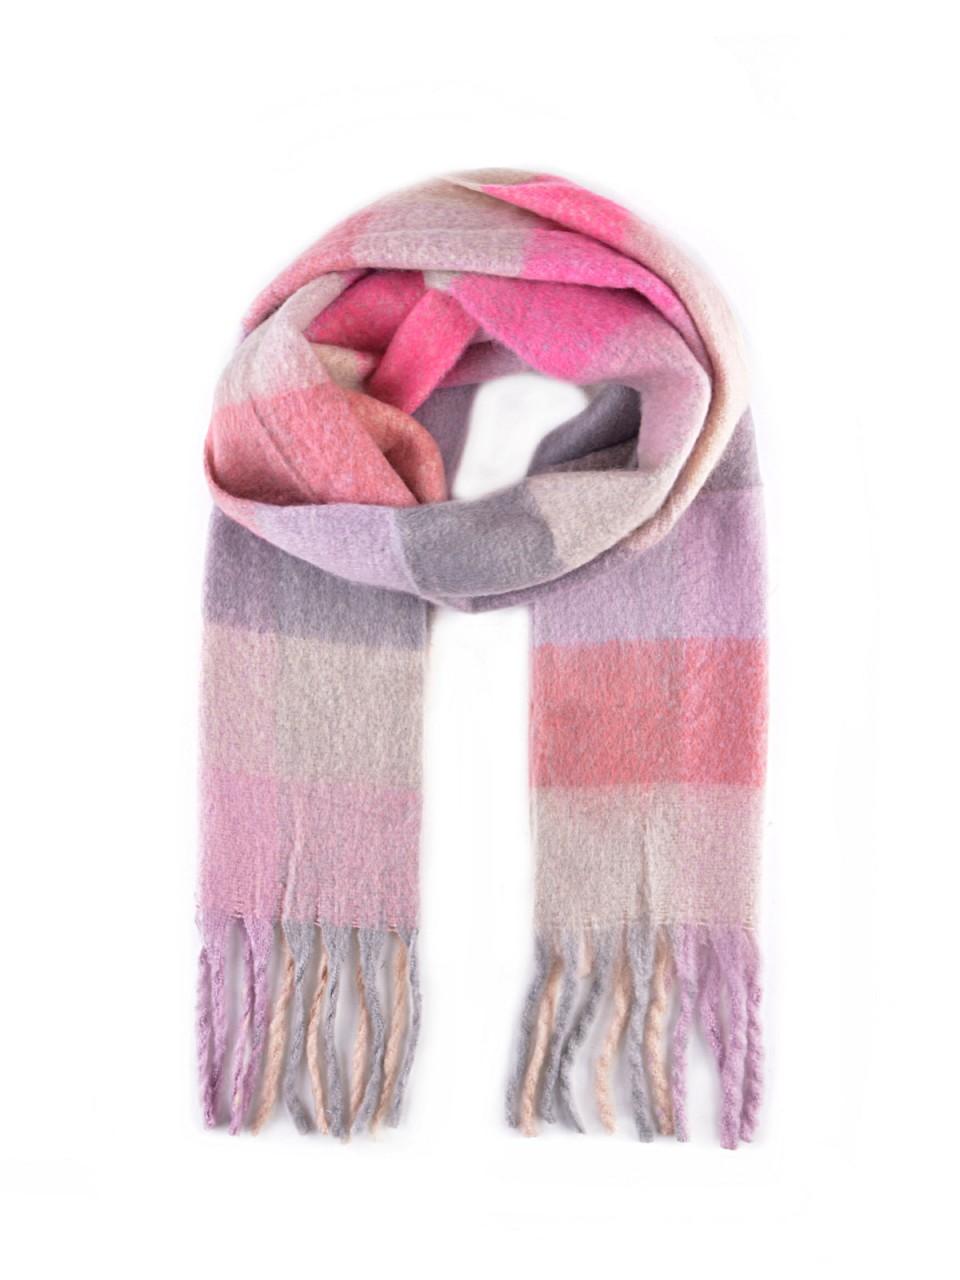 Schals - SMITH SOUL Damen Schal, rosa  - Onlineshop Designermode.com